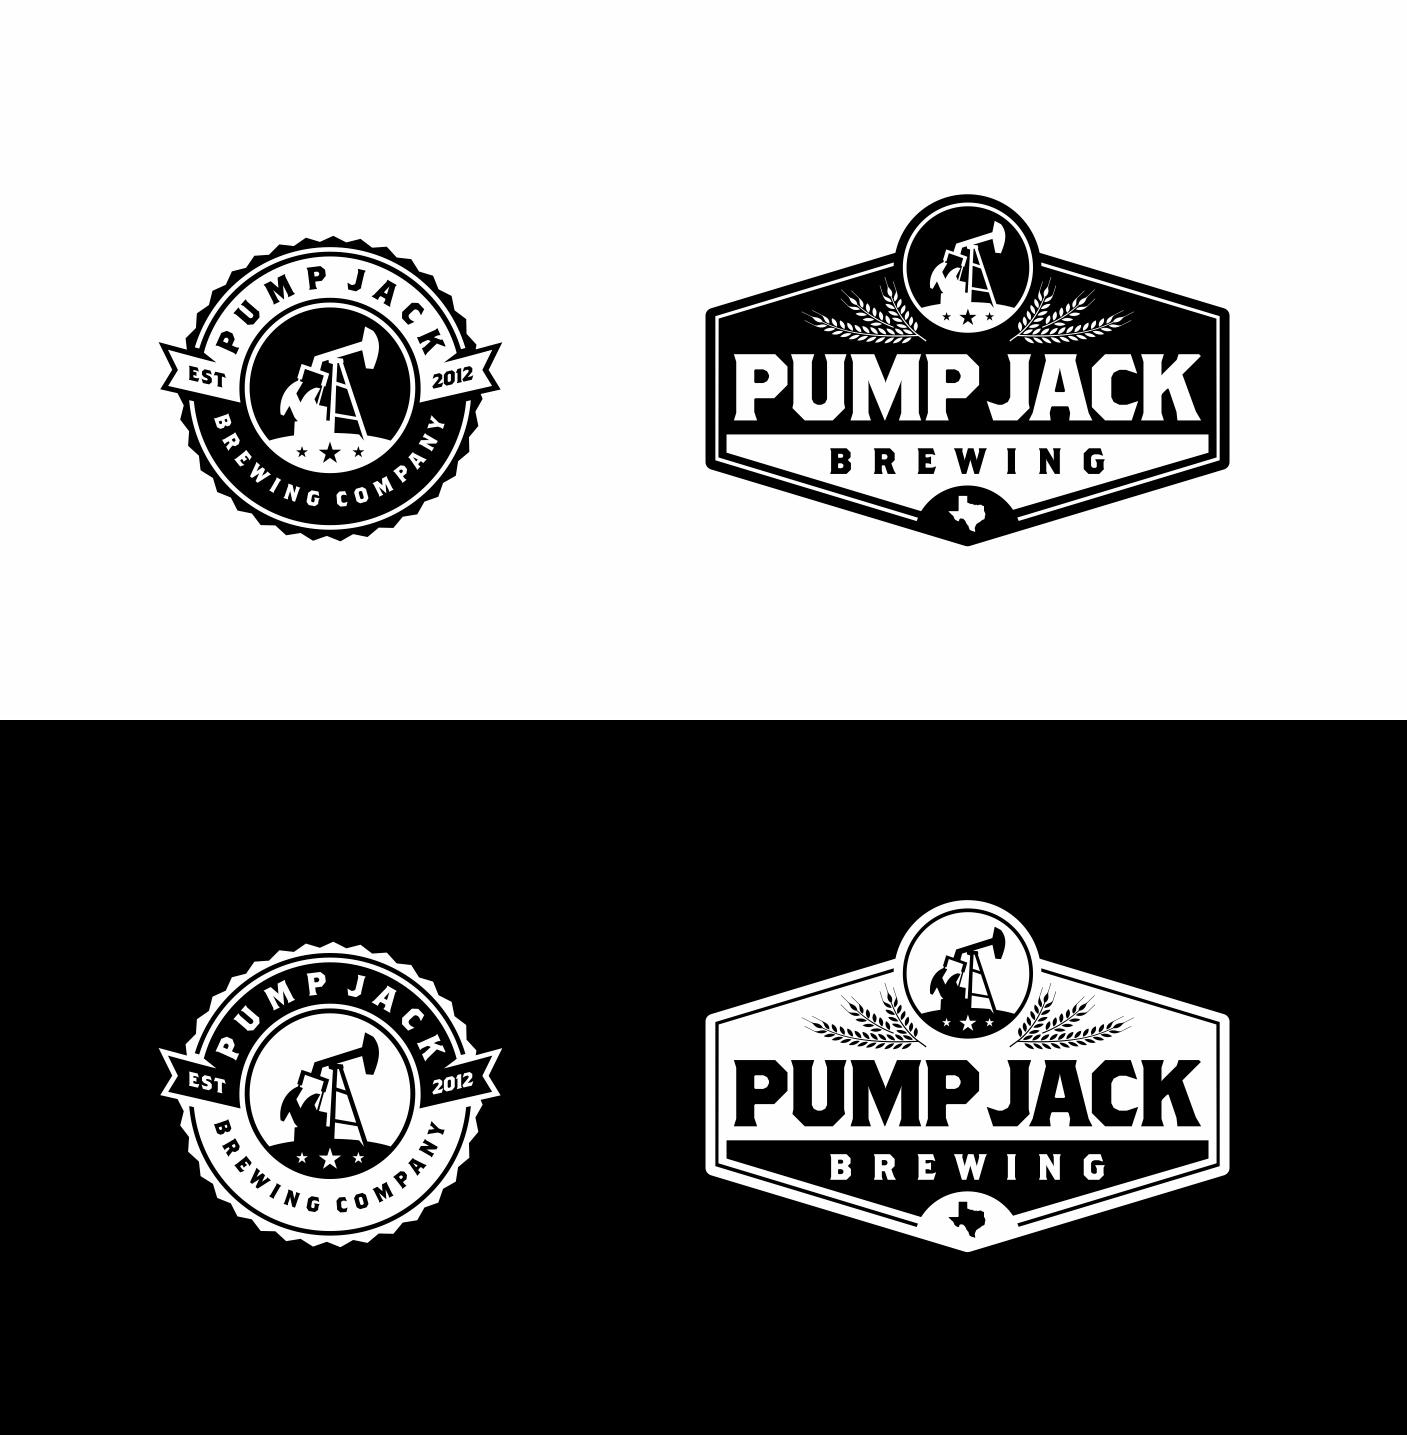 Pump Jack Brewing Company needs a new logo